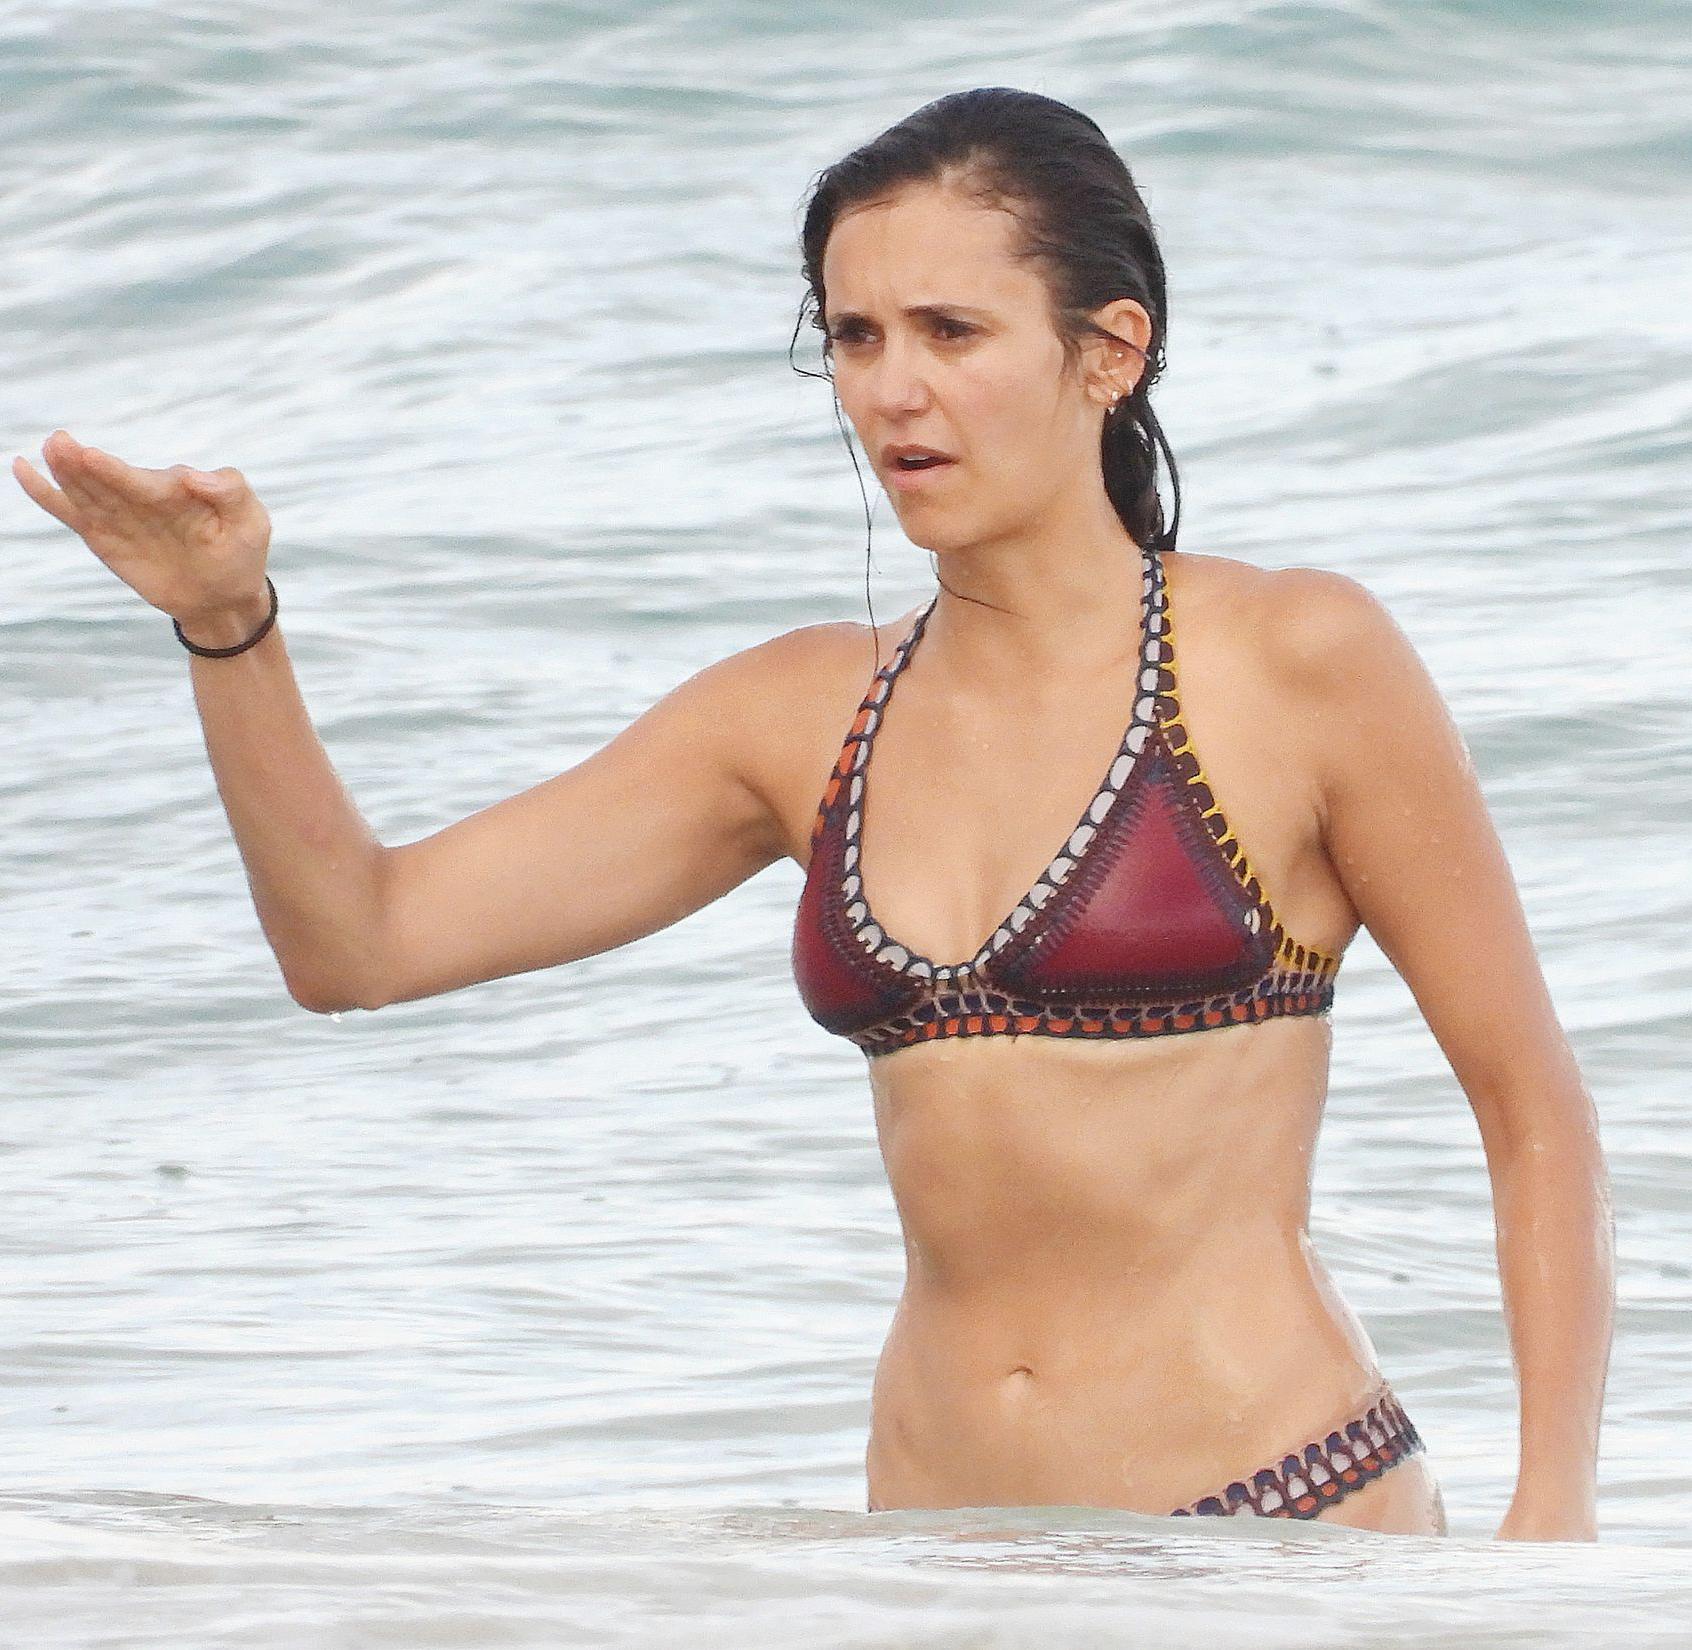 Nina Dobrev Paparazzi Wet Bikini Beach Photos